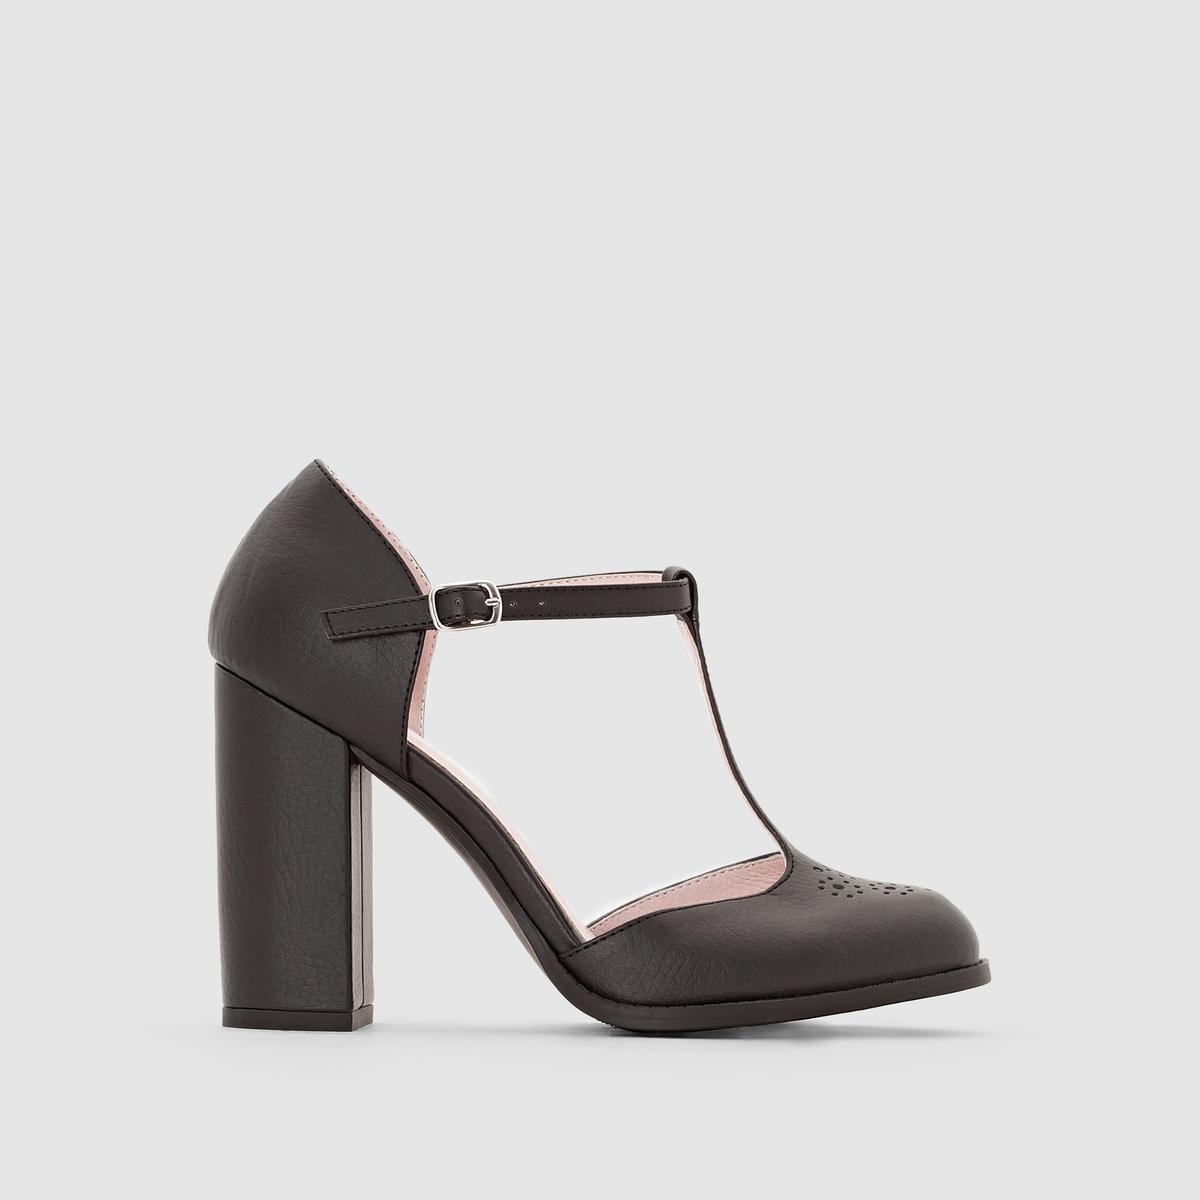 Туфли с ремешком на высоком каблуке от MADEMOISELLE R